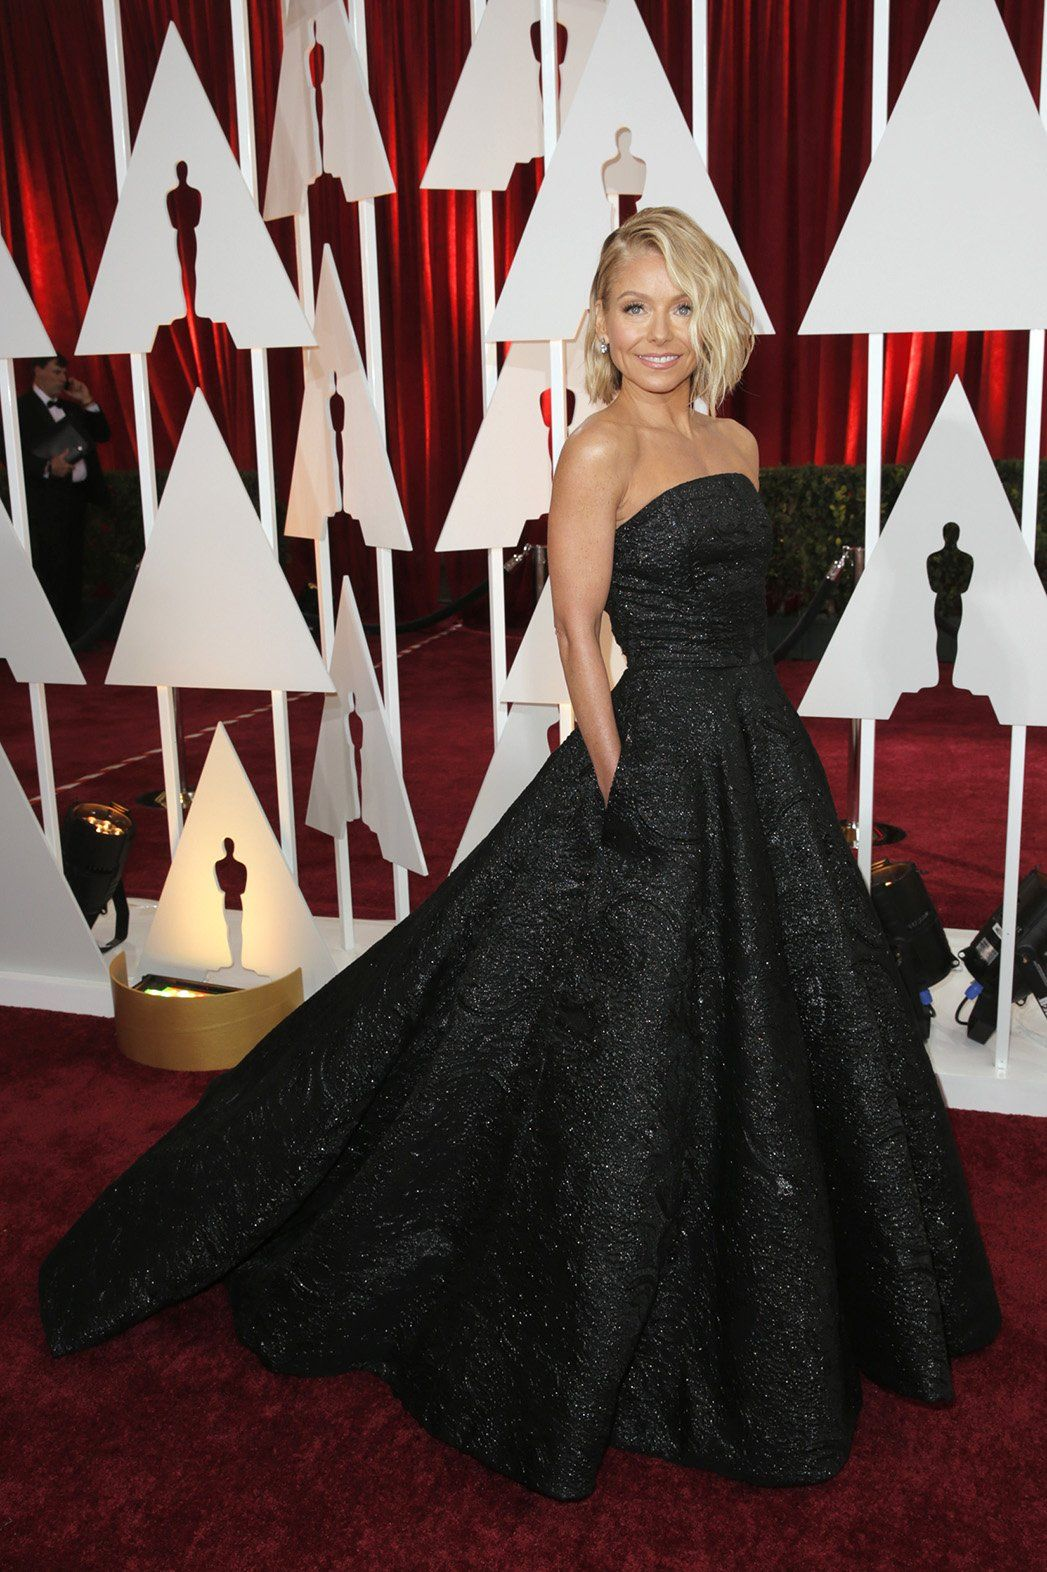 Oscars Photos Red Carpet Photos From  Academy Awards Pret A Reporter